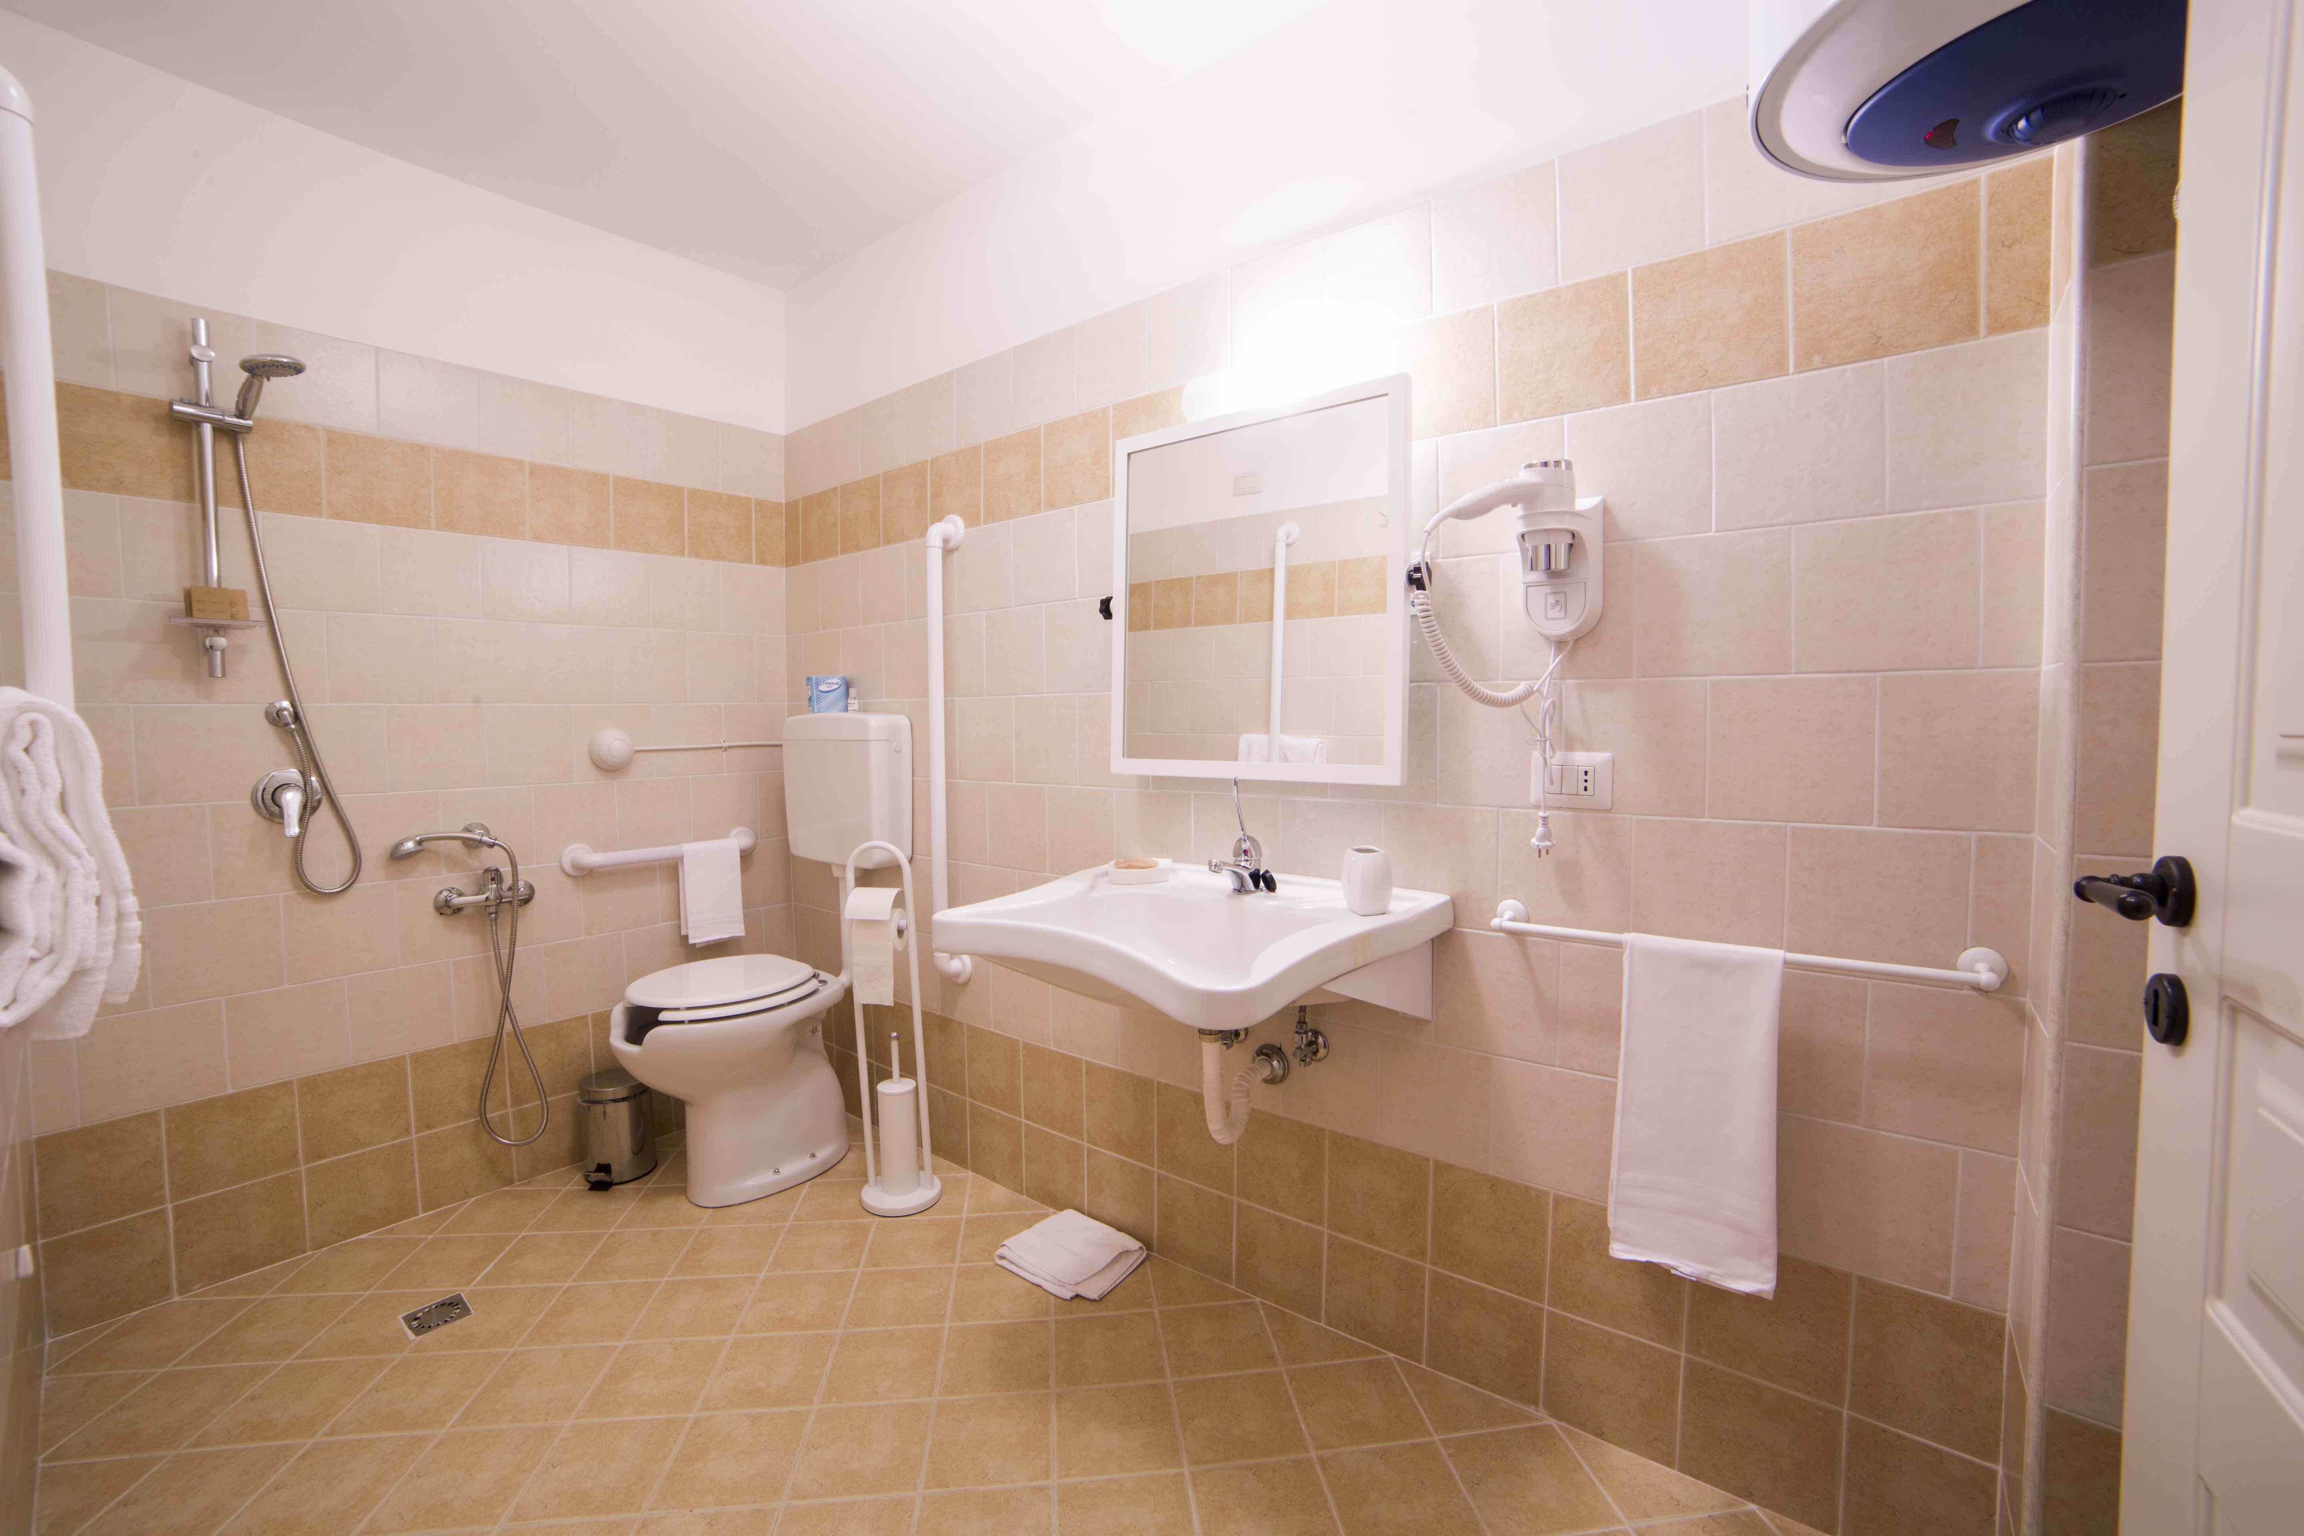 Residence per disabili dimora de mauro catania bookingbility